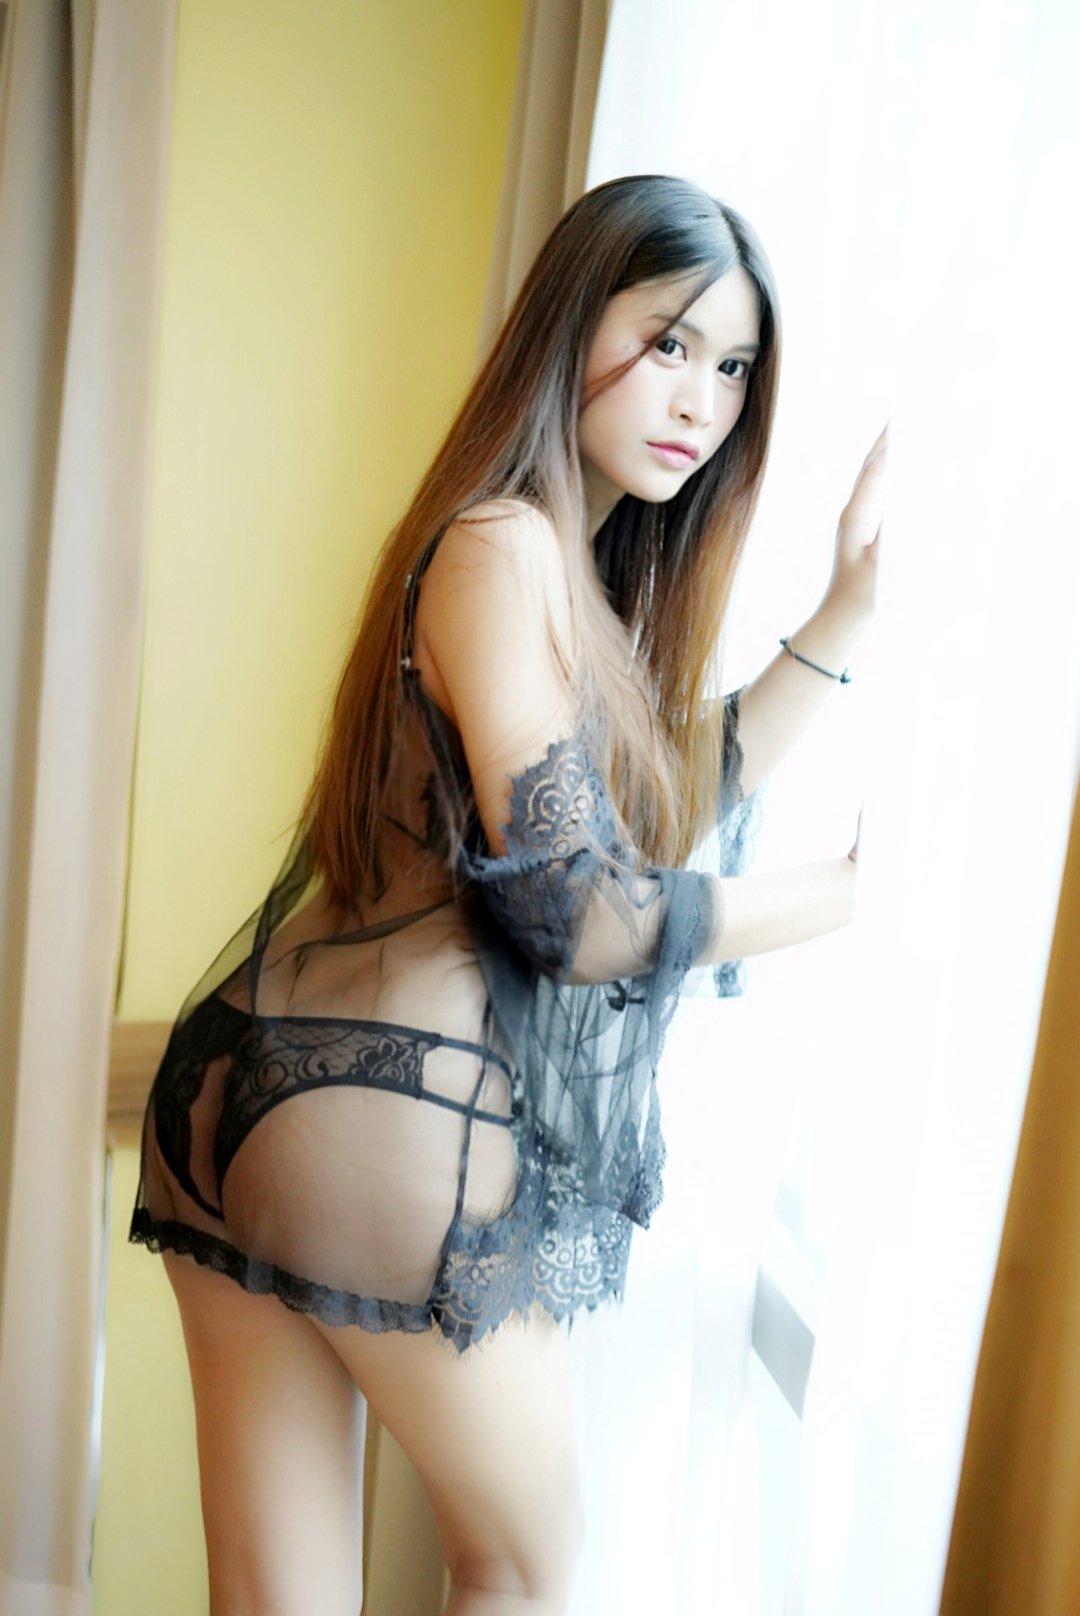 Ladyboy Escort Bangkok